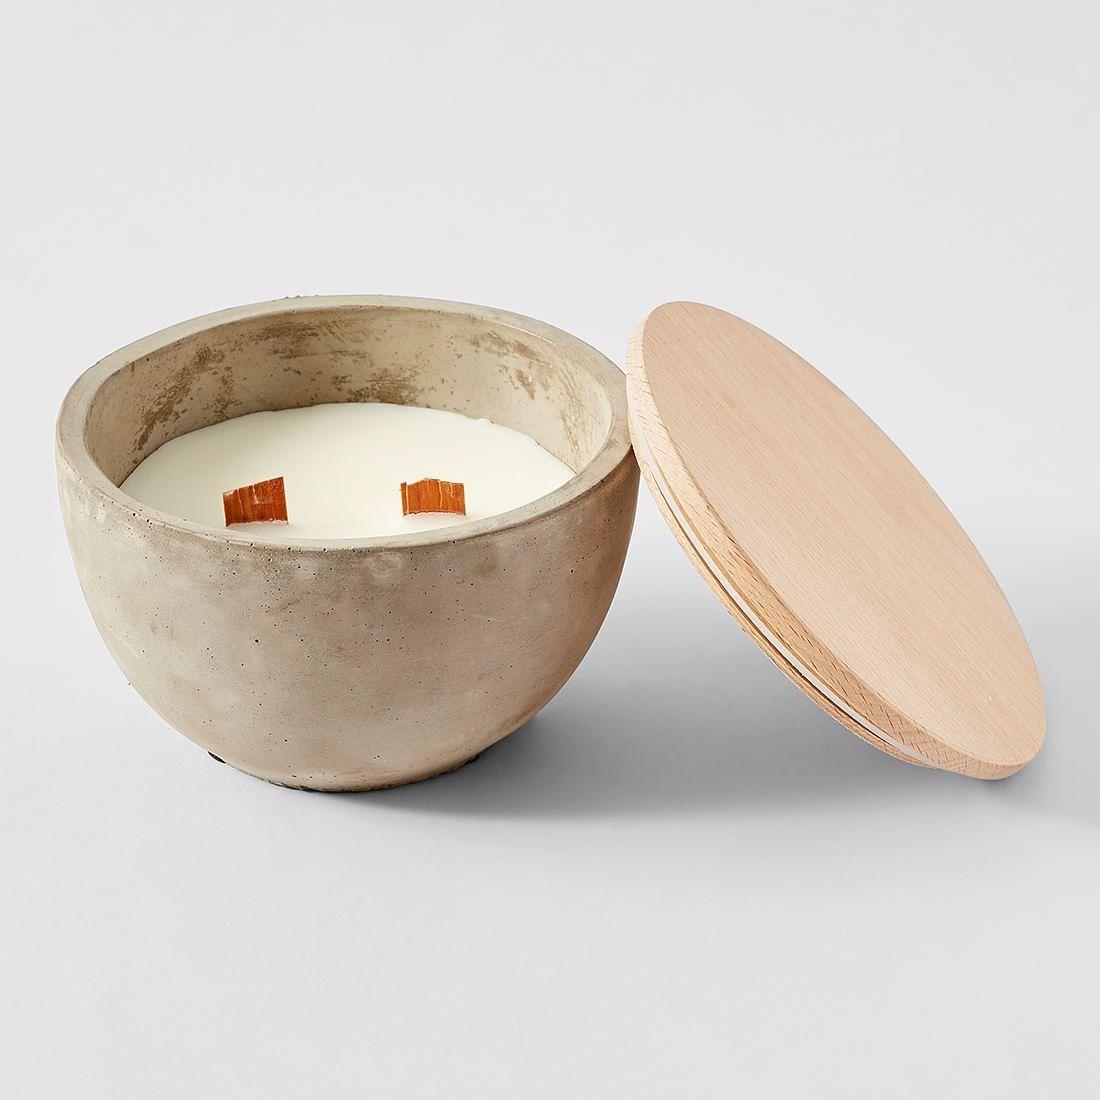 Concrete citronella candle bowl with images bowl